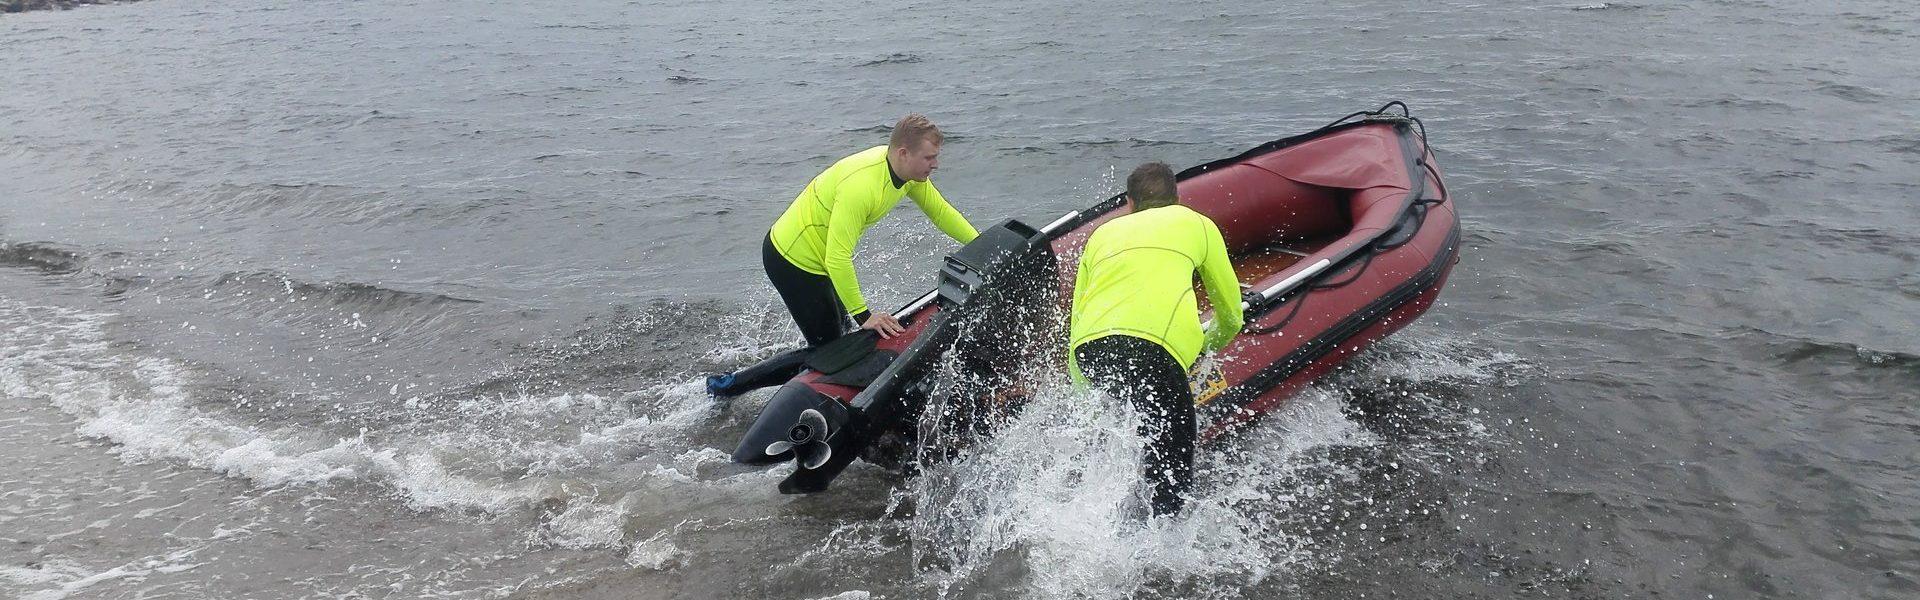 Bådtræning - Livredderklub Midtjylland